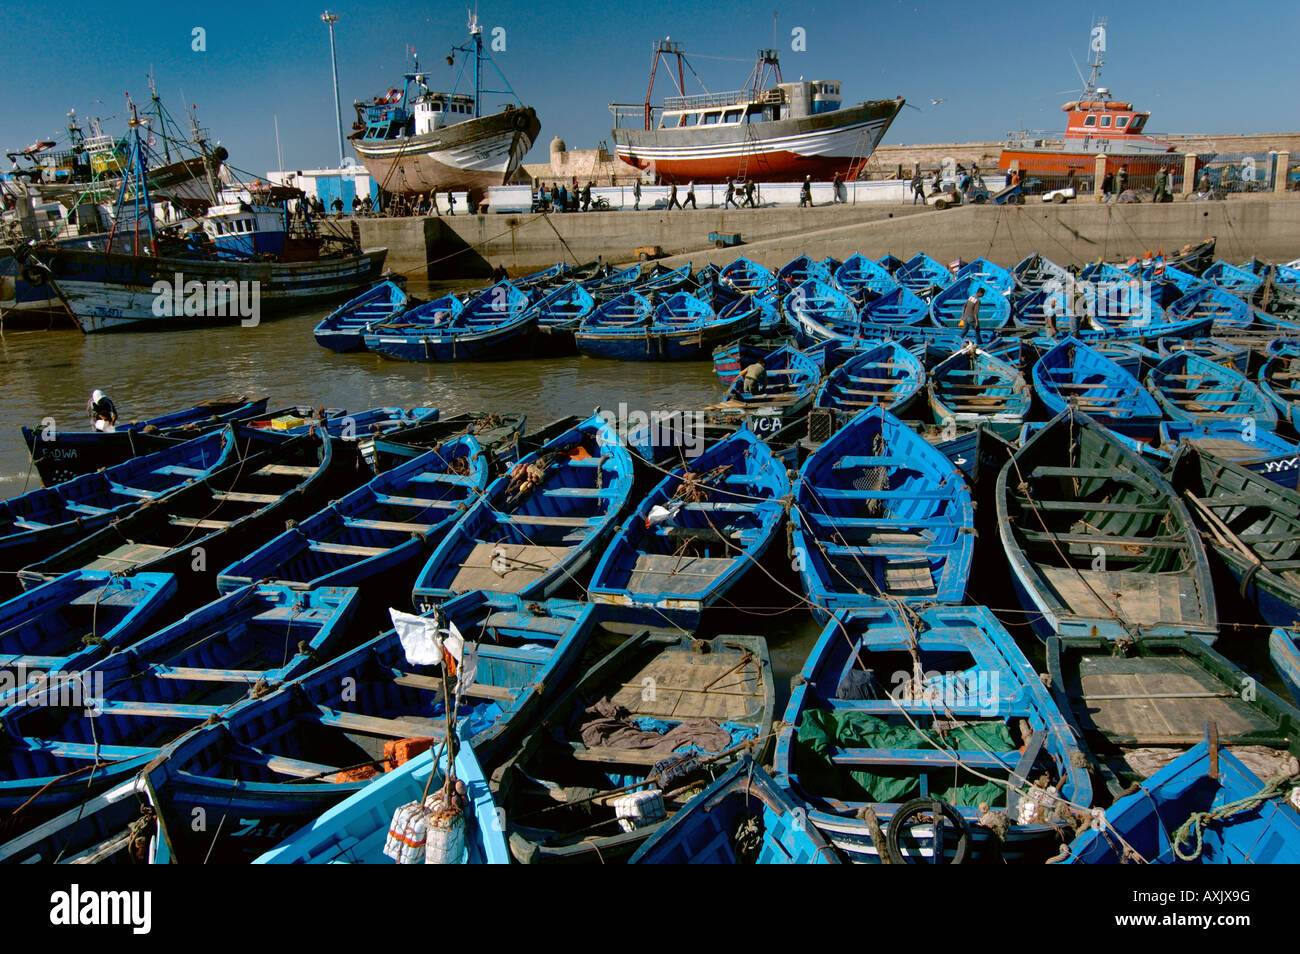 Small fishing boats in port Essaouria Morocco - Stock Image